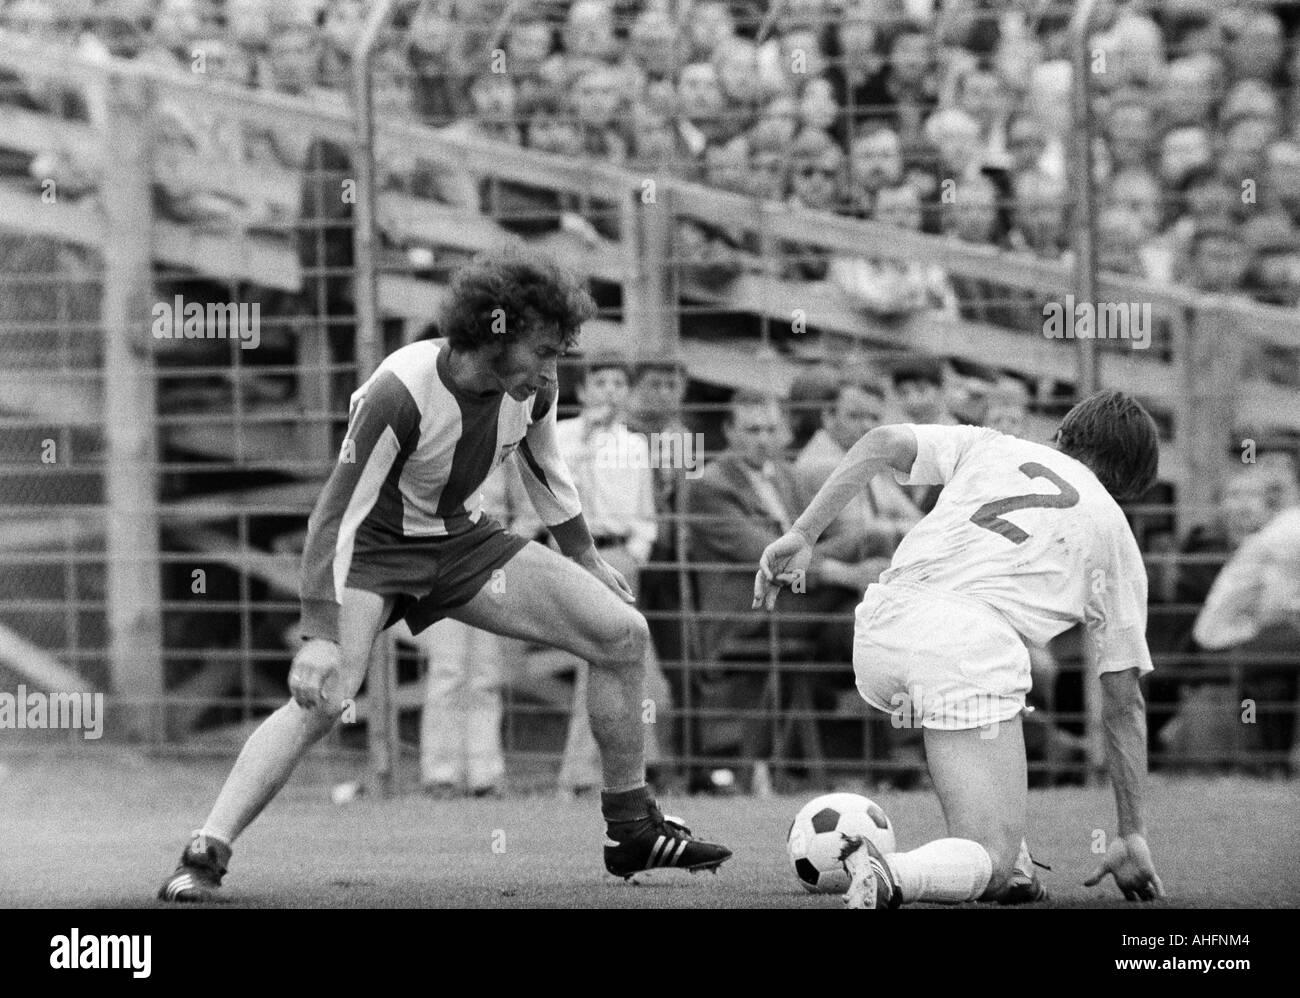 football, Bundesliga, 1971/1972, Stadium Radrennbahn near the Muengersdorfer Stadium in Cologne, 1. FC Cologne versus FC Bayern Munich 1:4, scene of the match, duel between Paul Breitner (FCB) left and Jupp Kapellmann (Koeln) - Stock Image